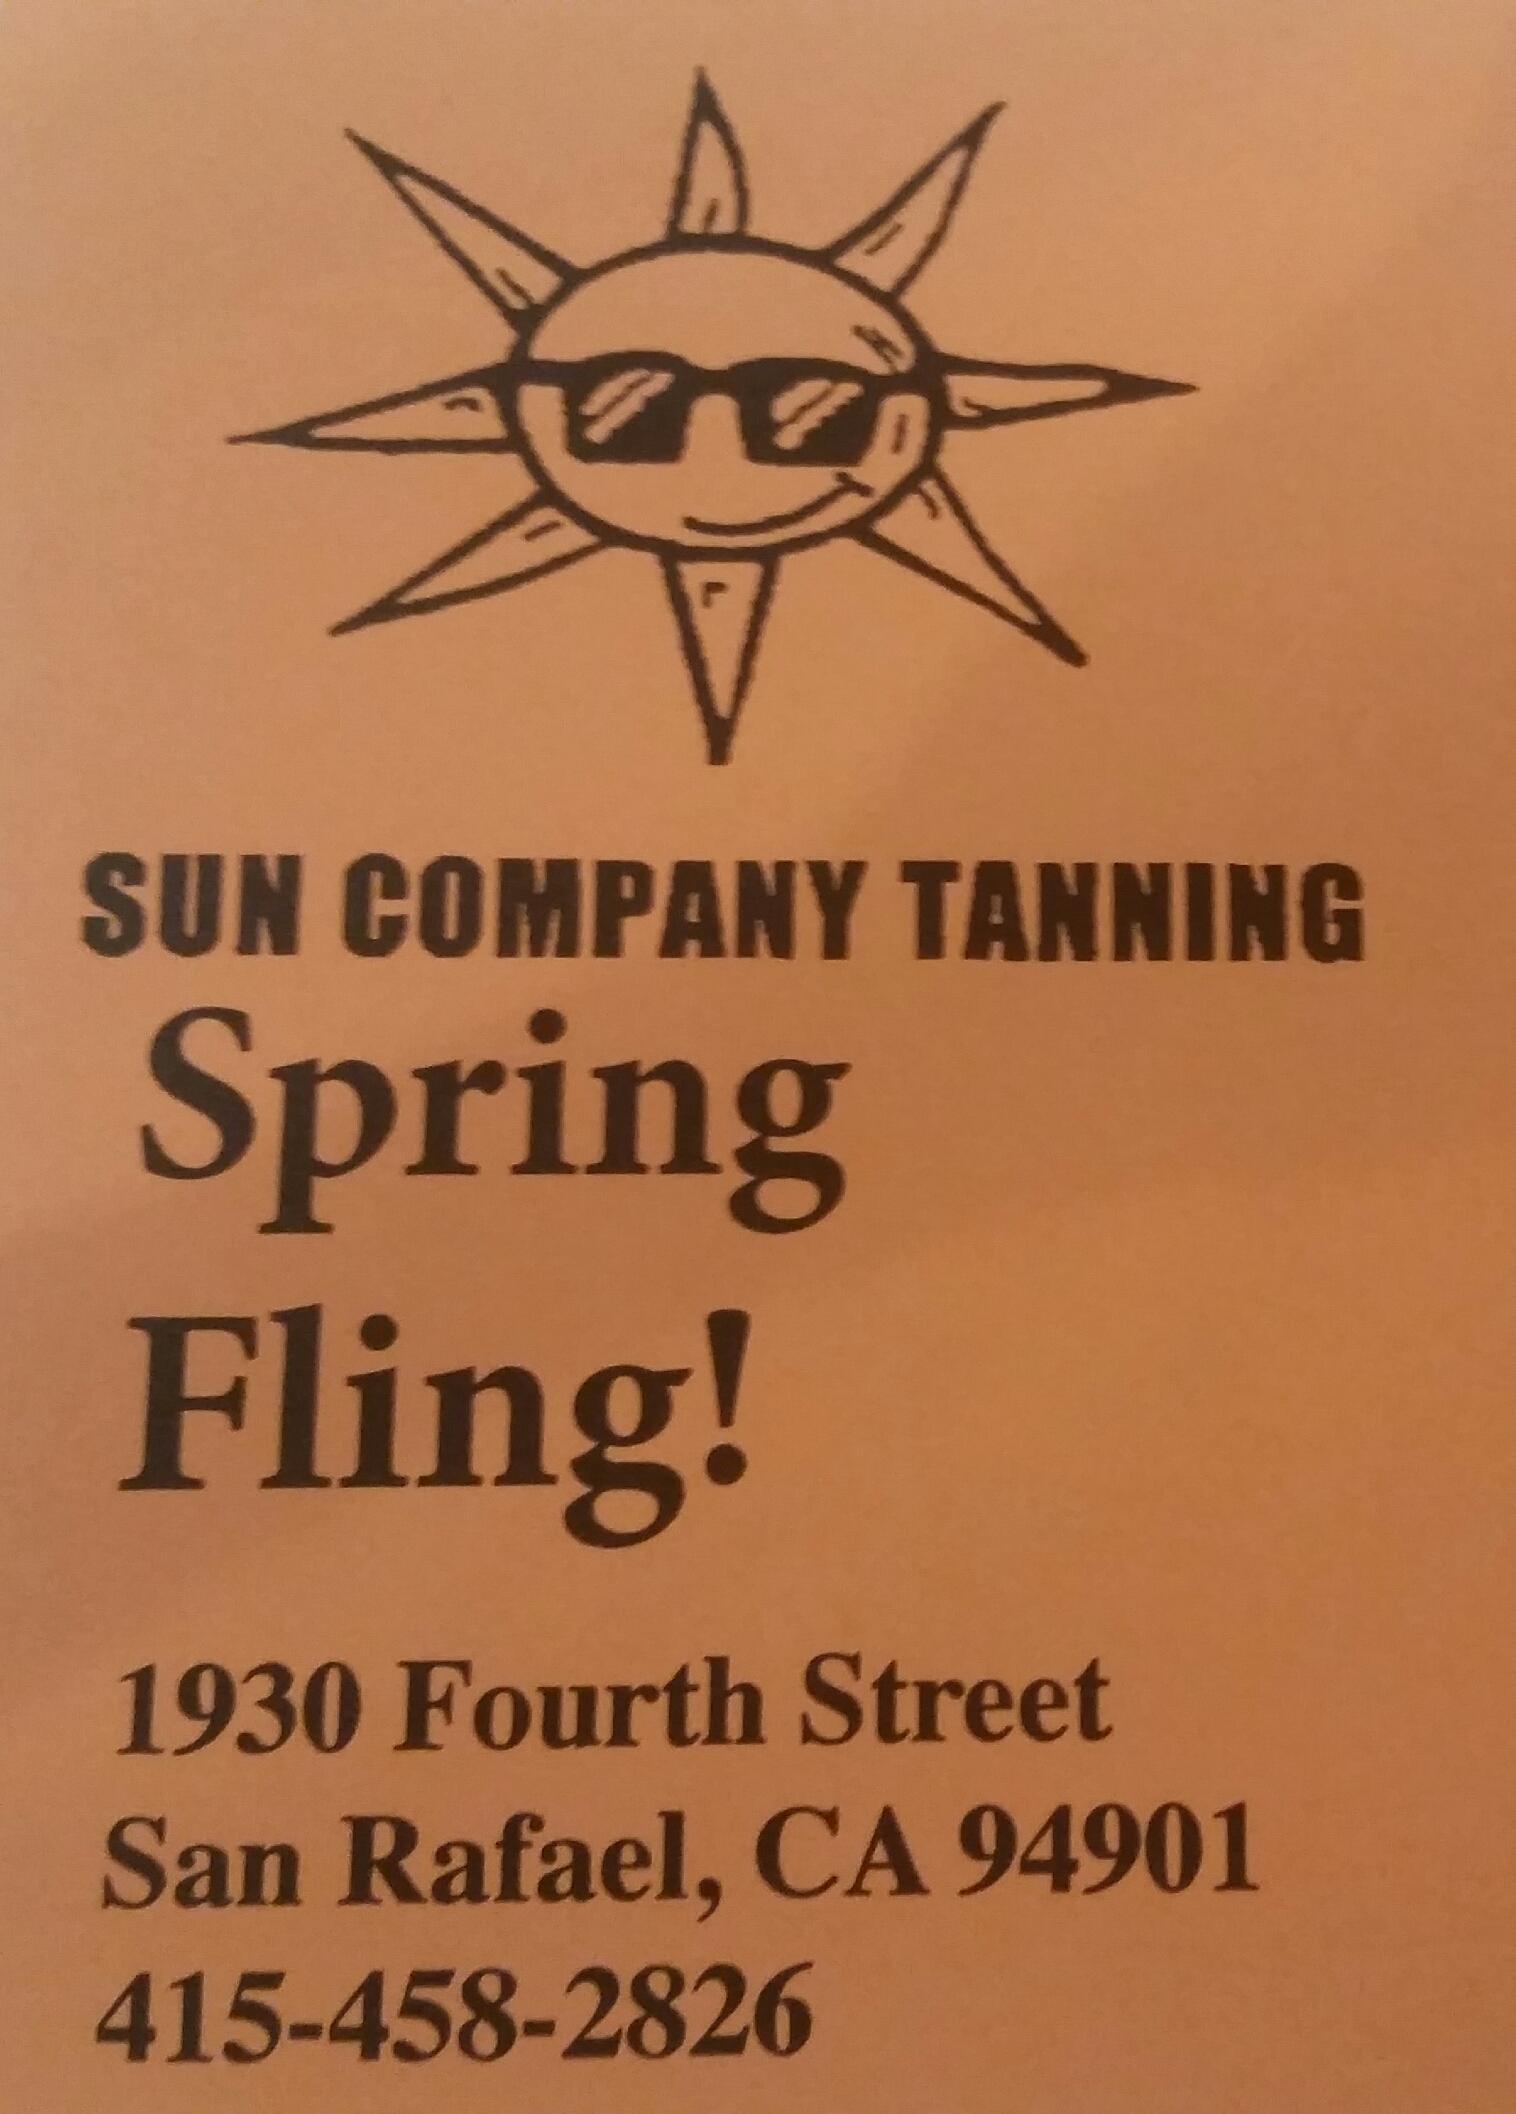 Sun Company Tanning